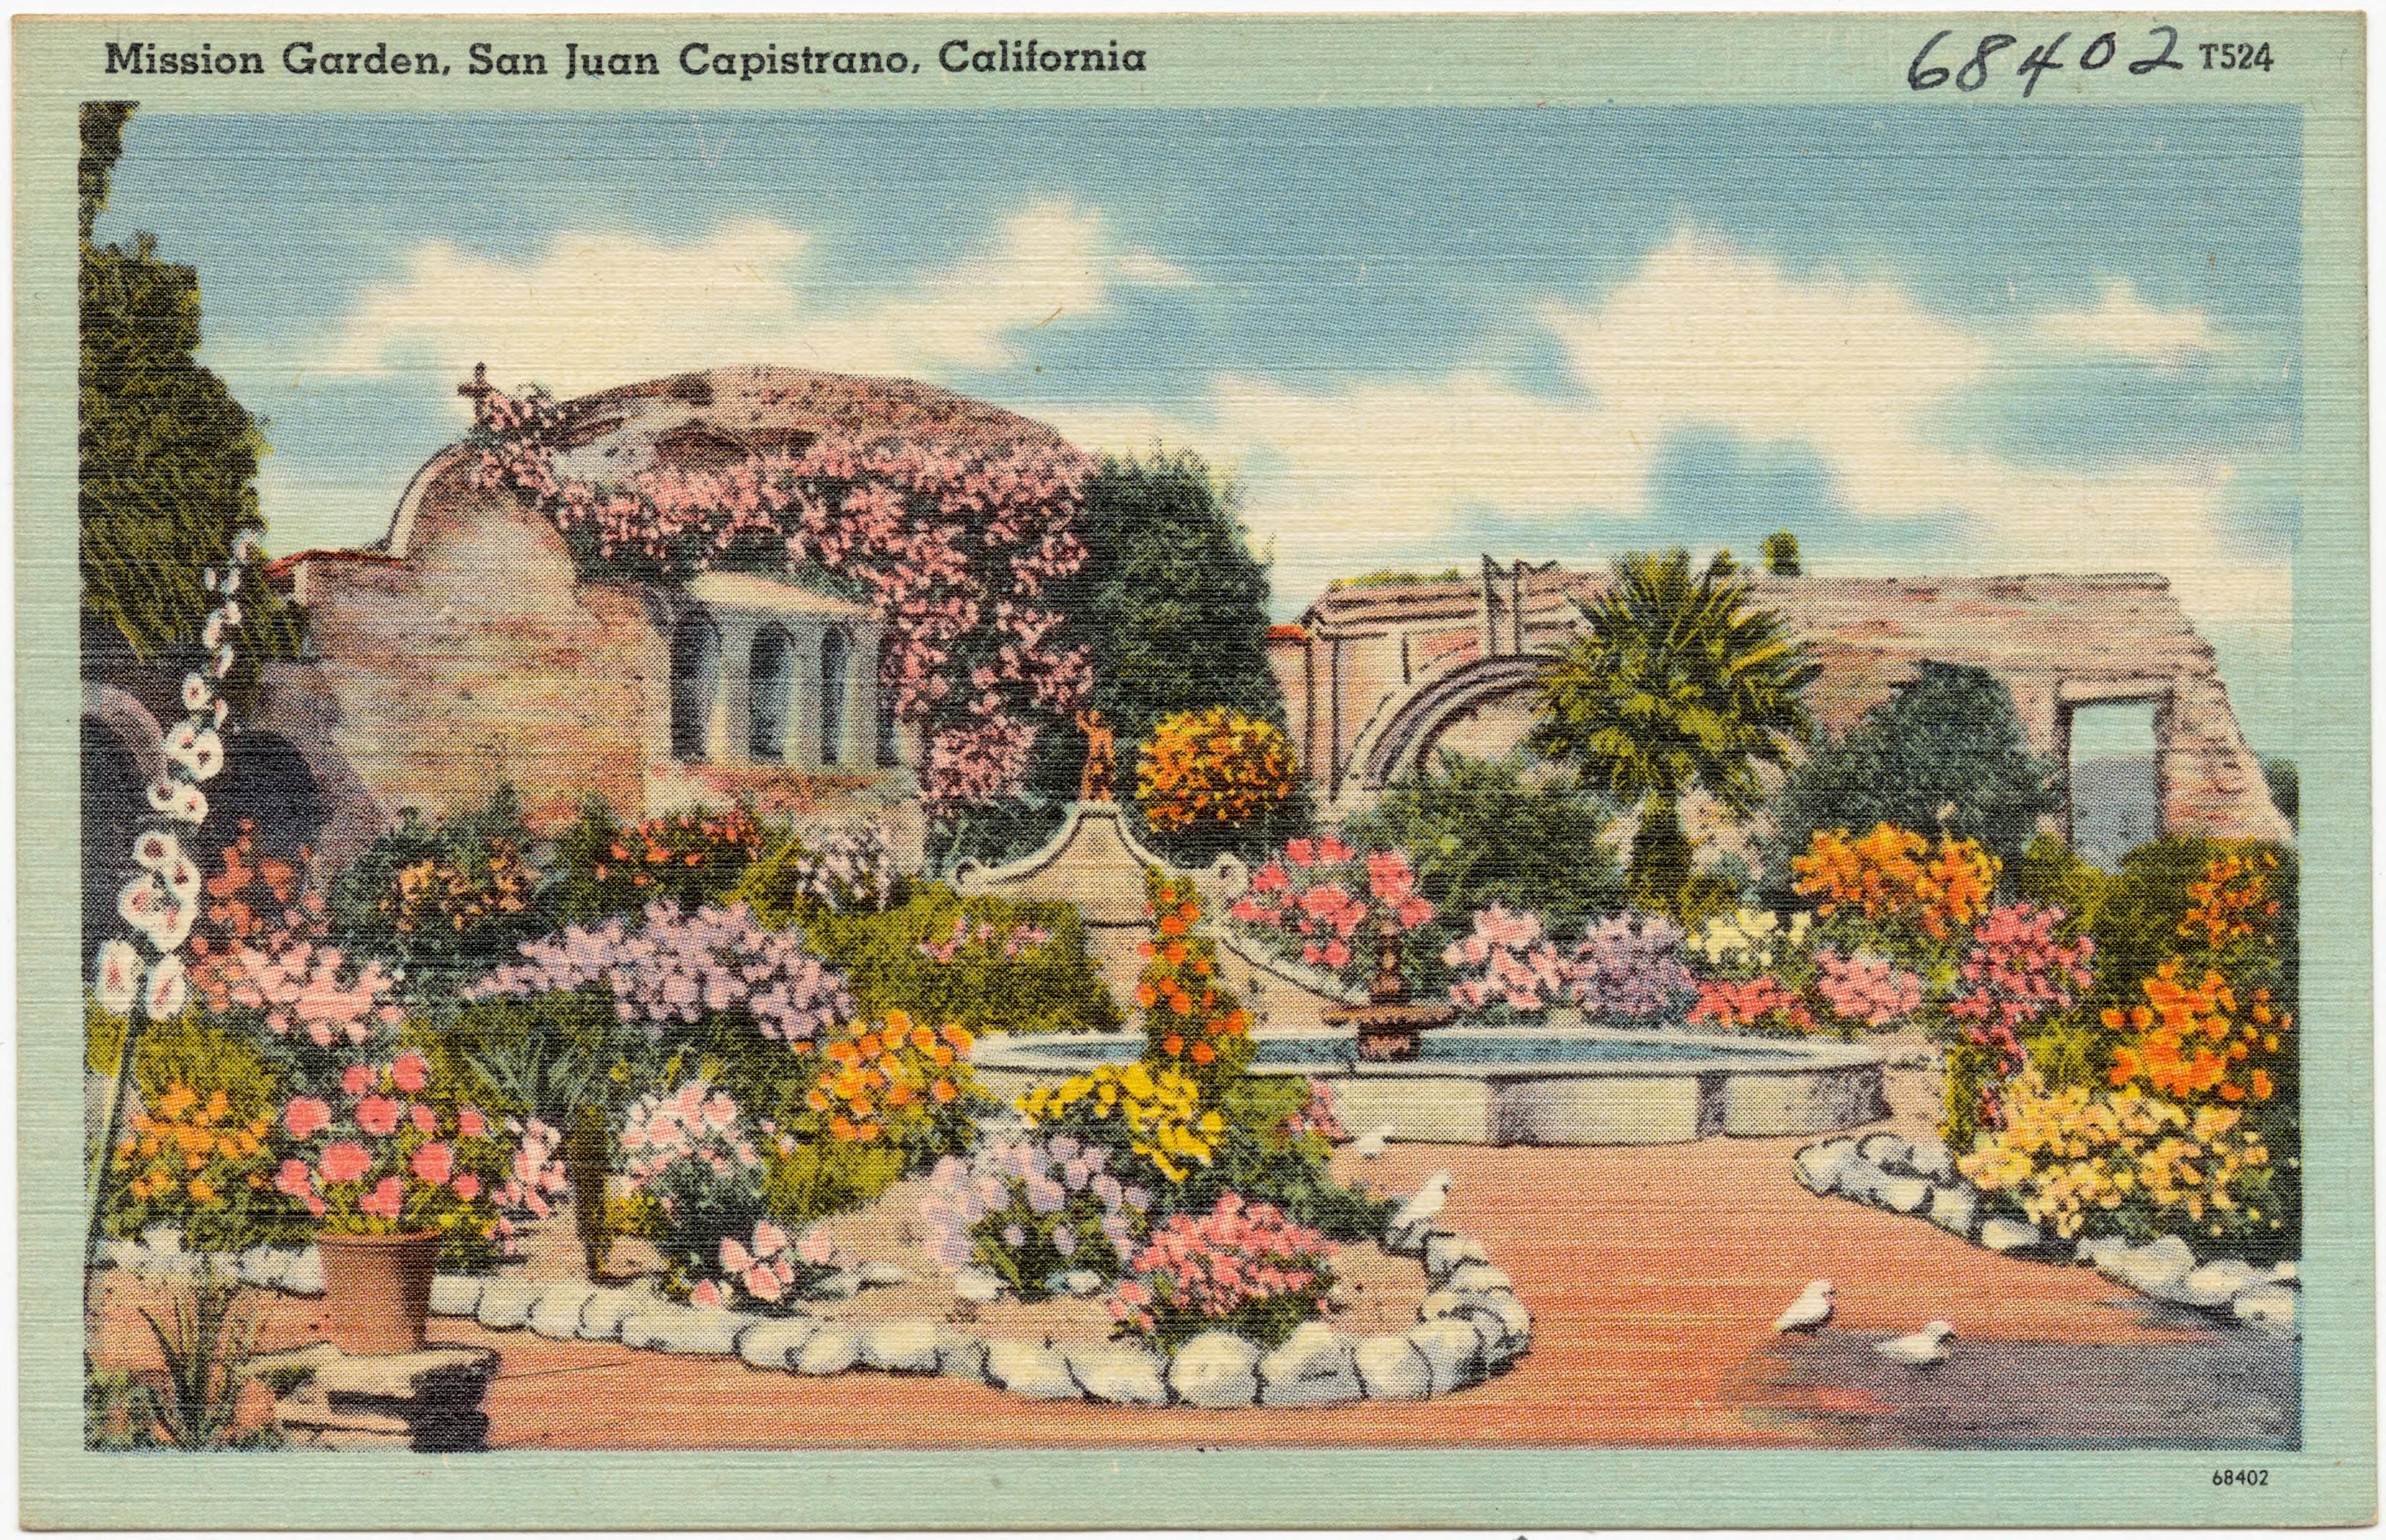 File:Mission Garden, San Juan Capistrano, California (68402).jpg ...